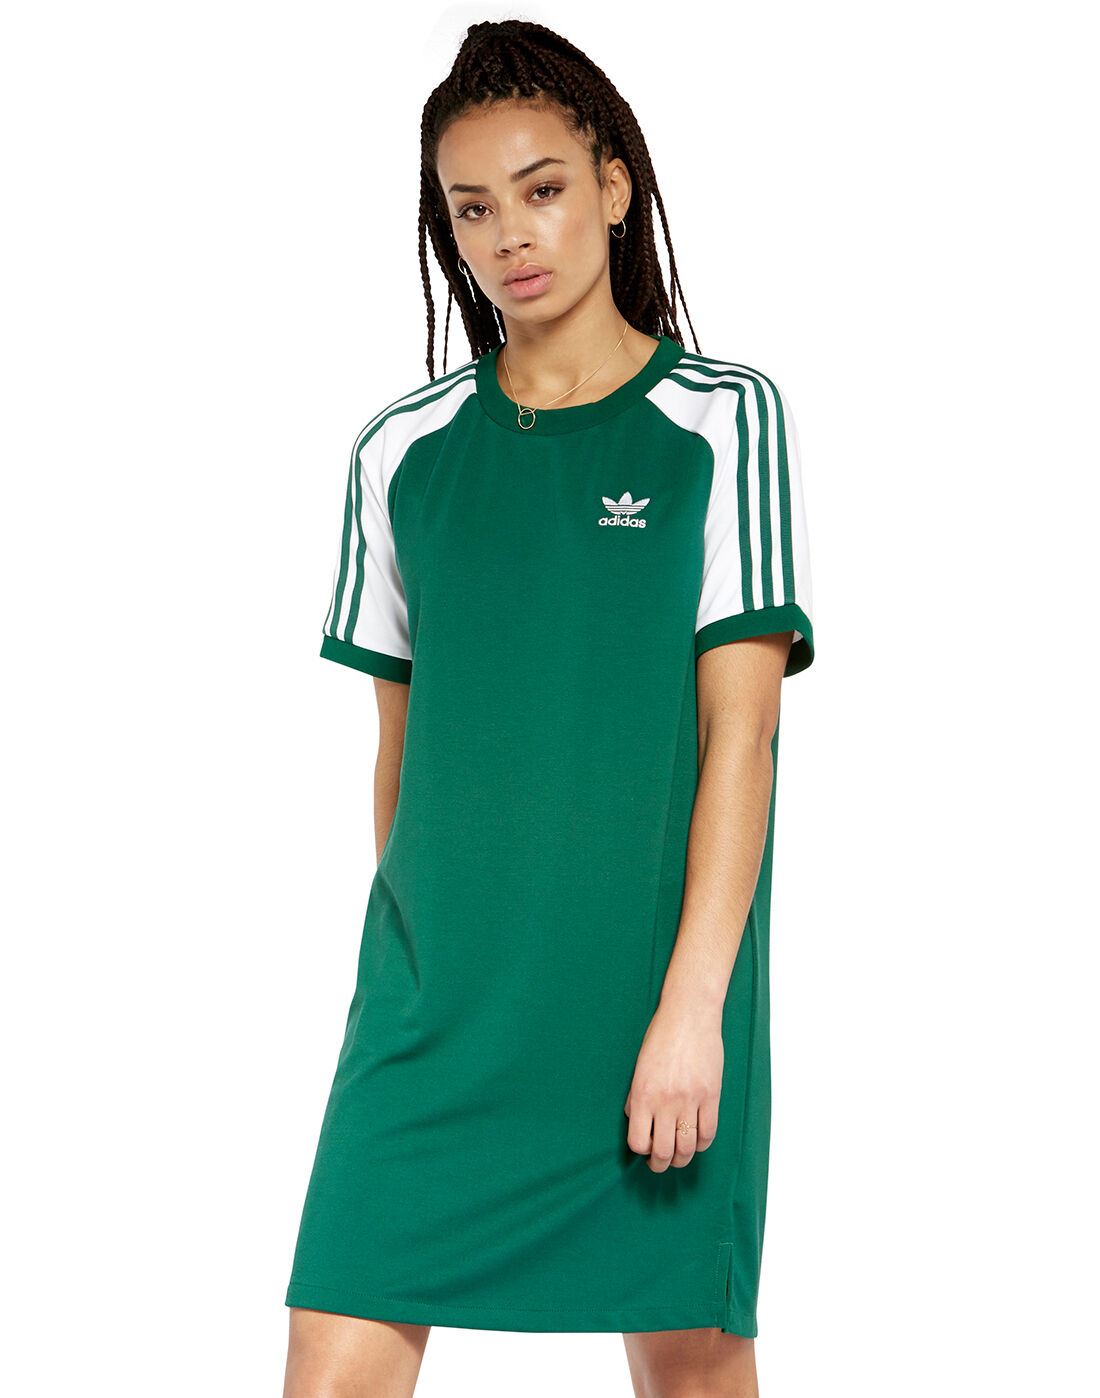 Women's Green adidas Originals Dress | Life Style Sports